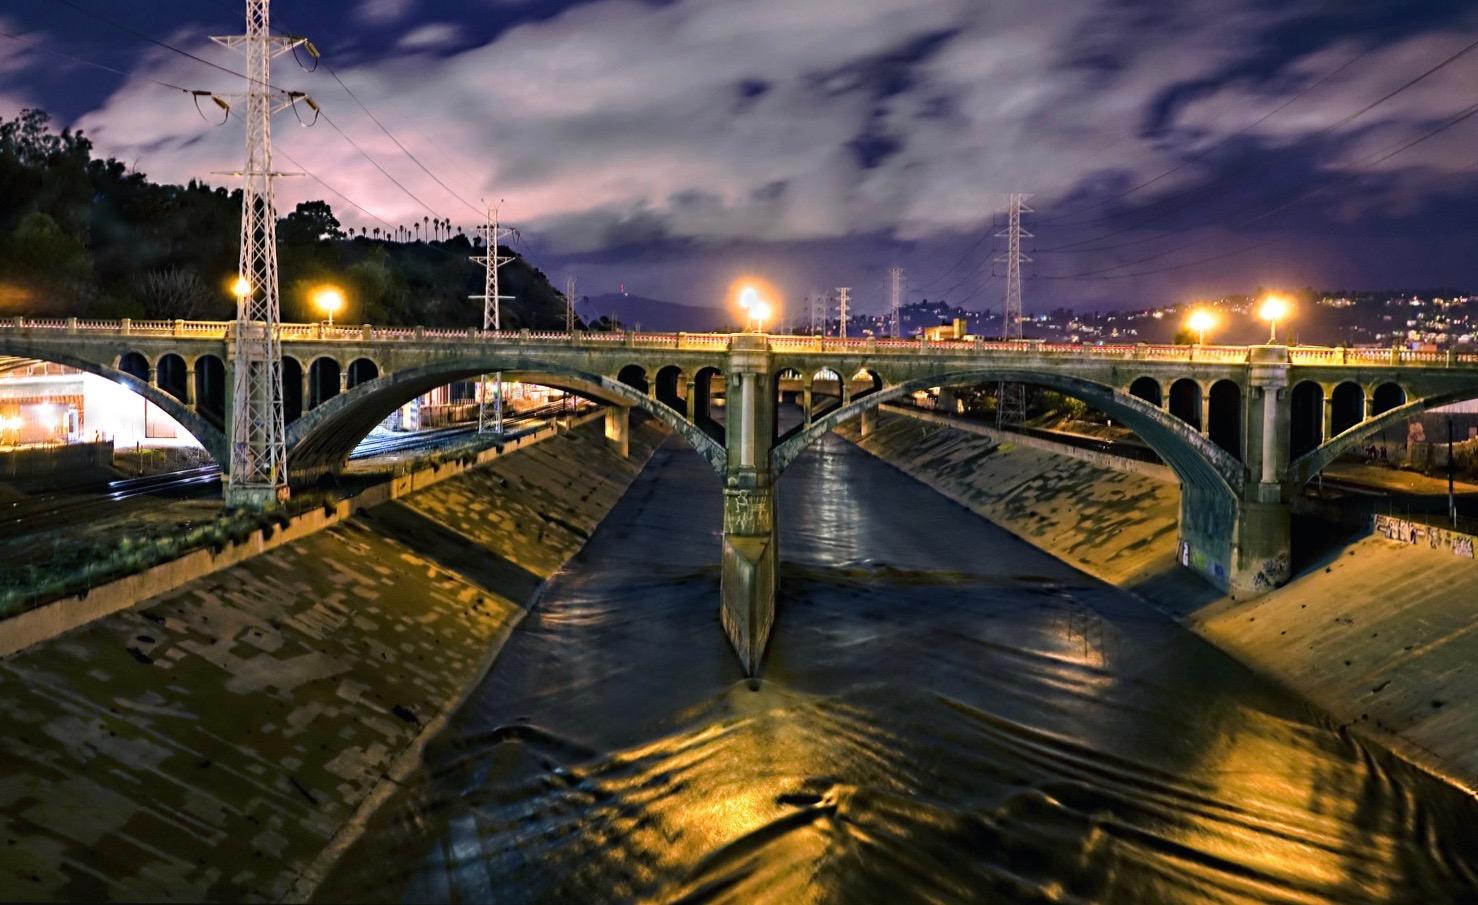 Broadway bridge as storm clears late night